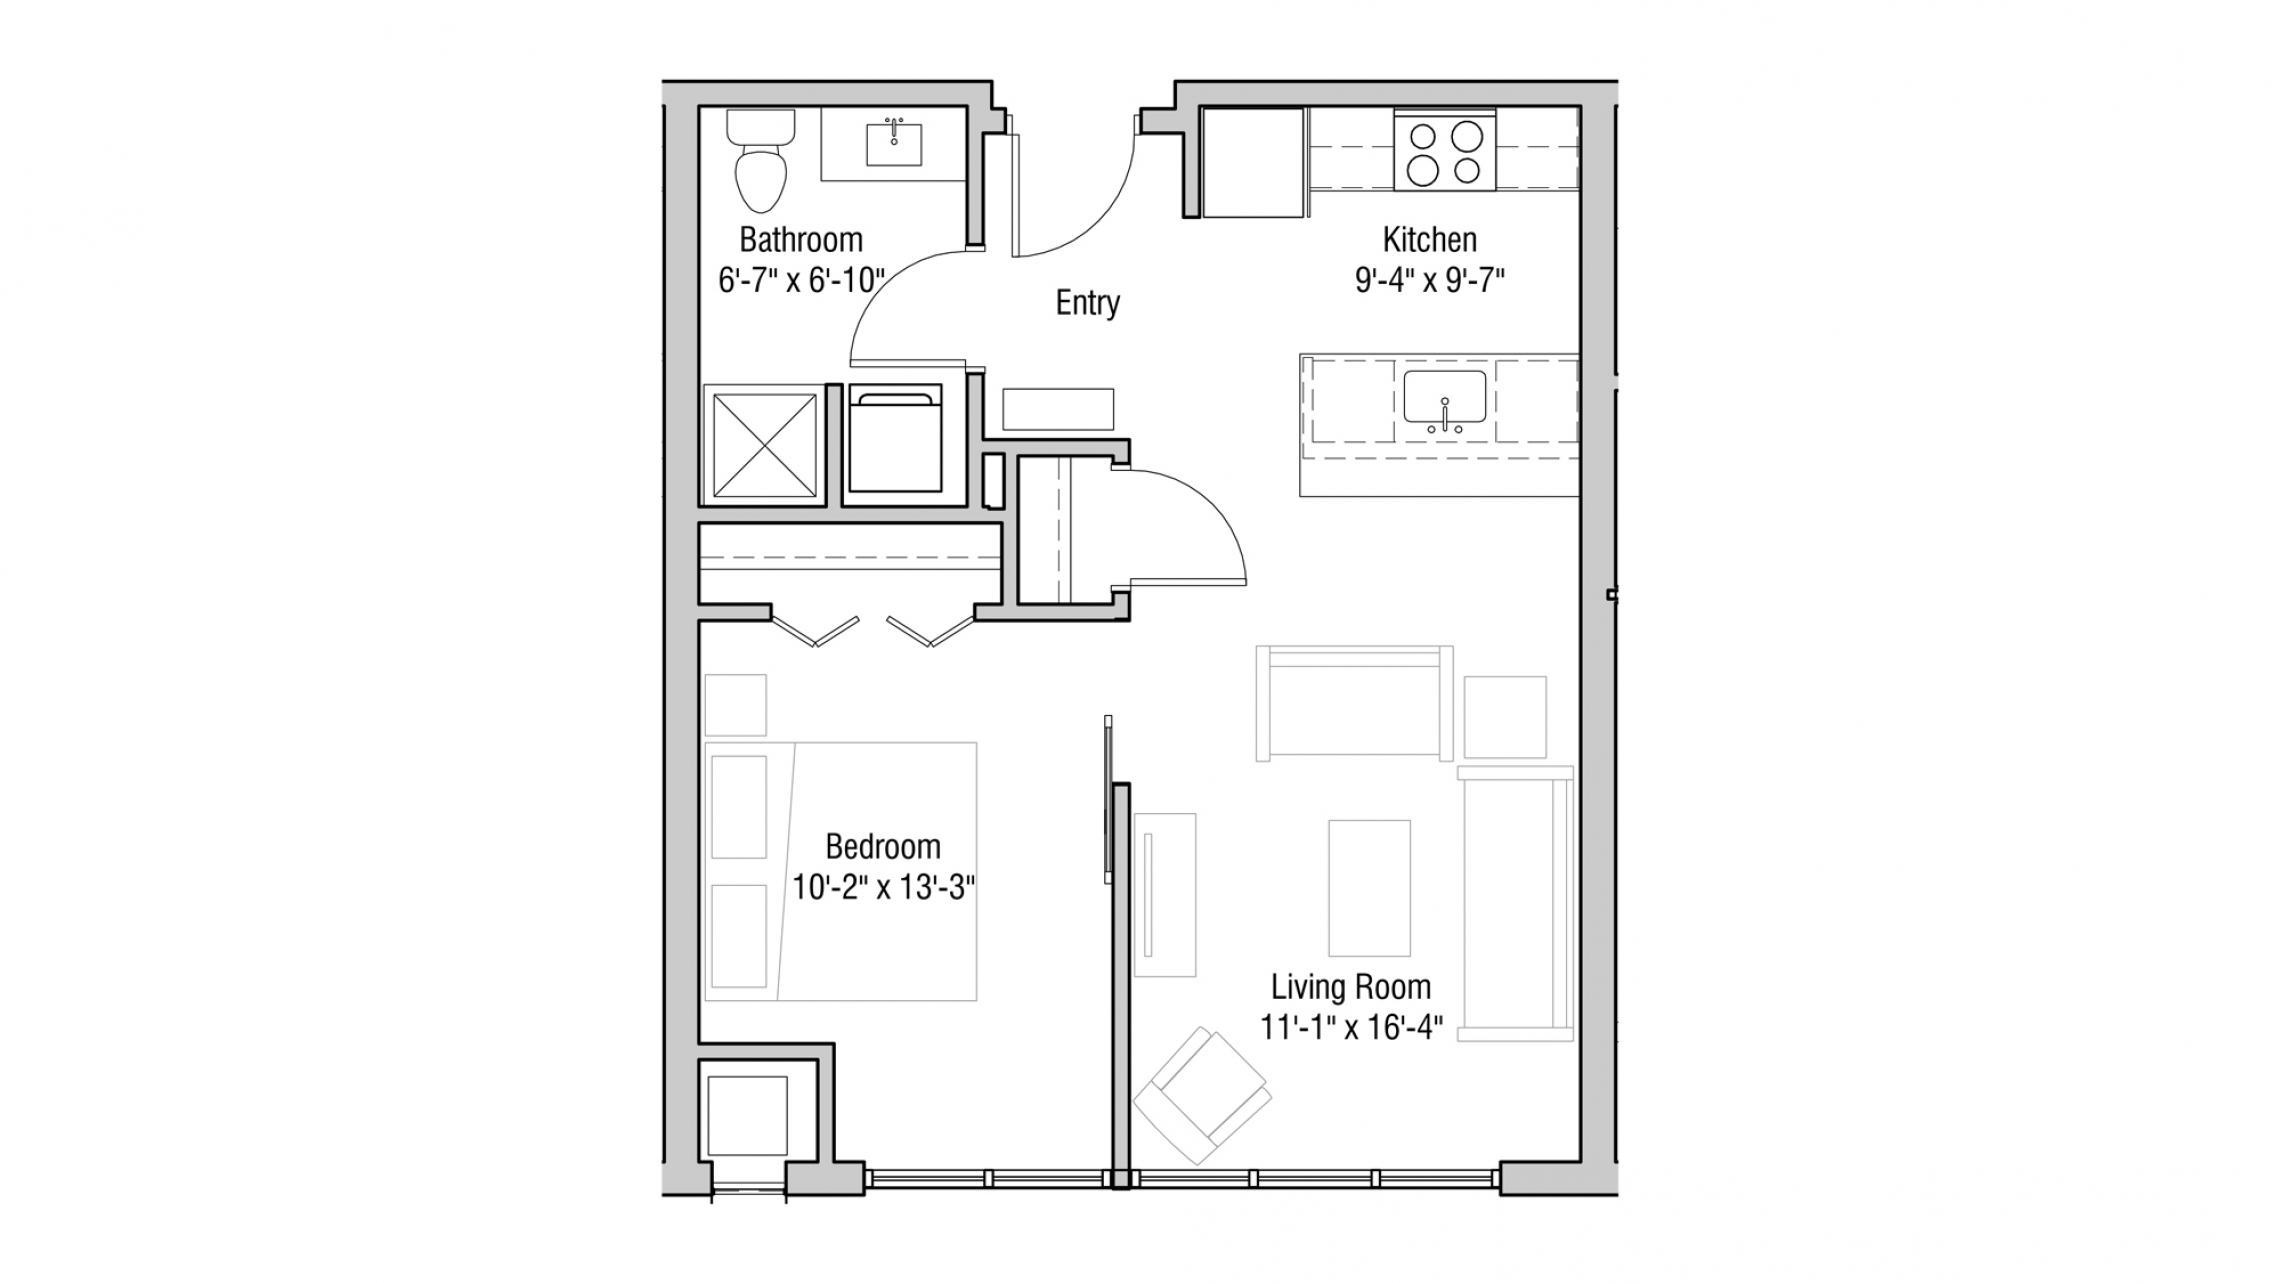 ULI Quarter Row 313 - One Bedroom, One Bathroom